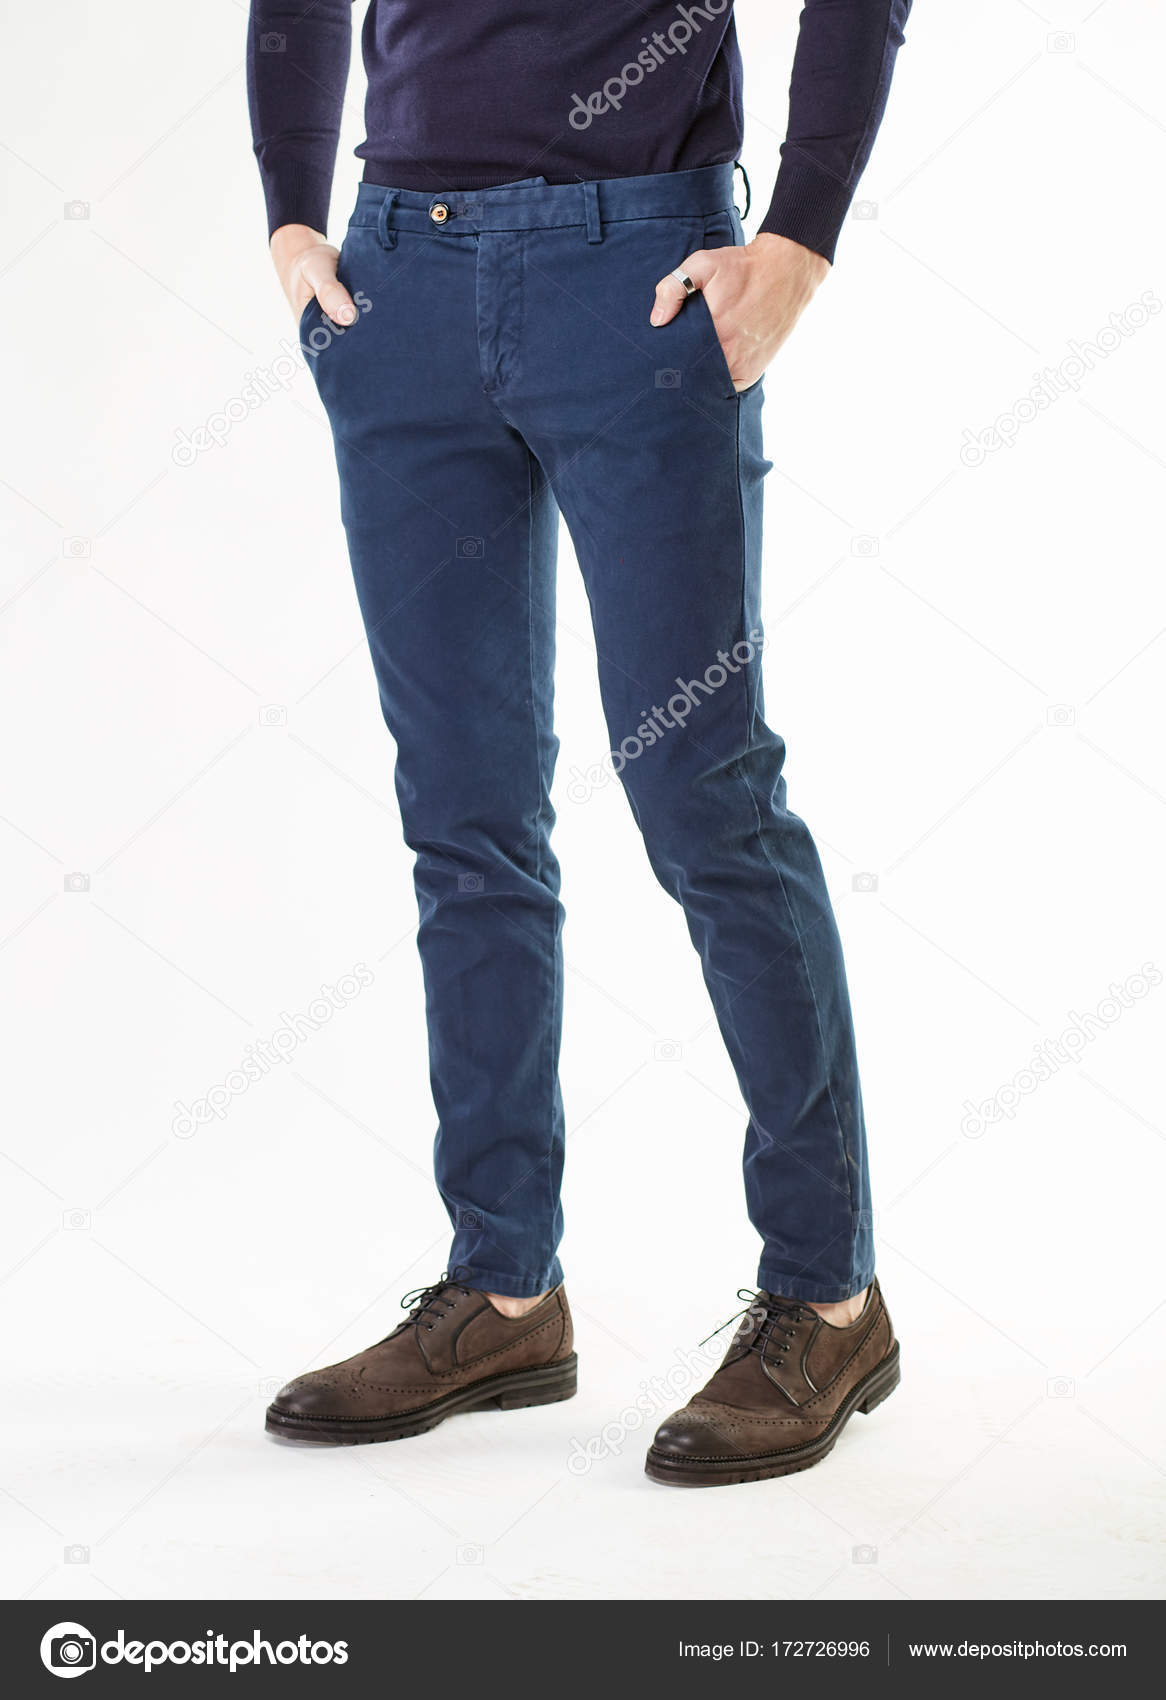 Oscuro Y Zapatos El Pantalón Hombre Posando Modelo En Clásico 0wP8nOkX